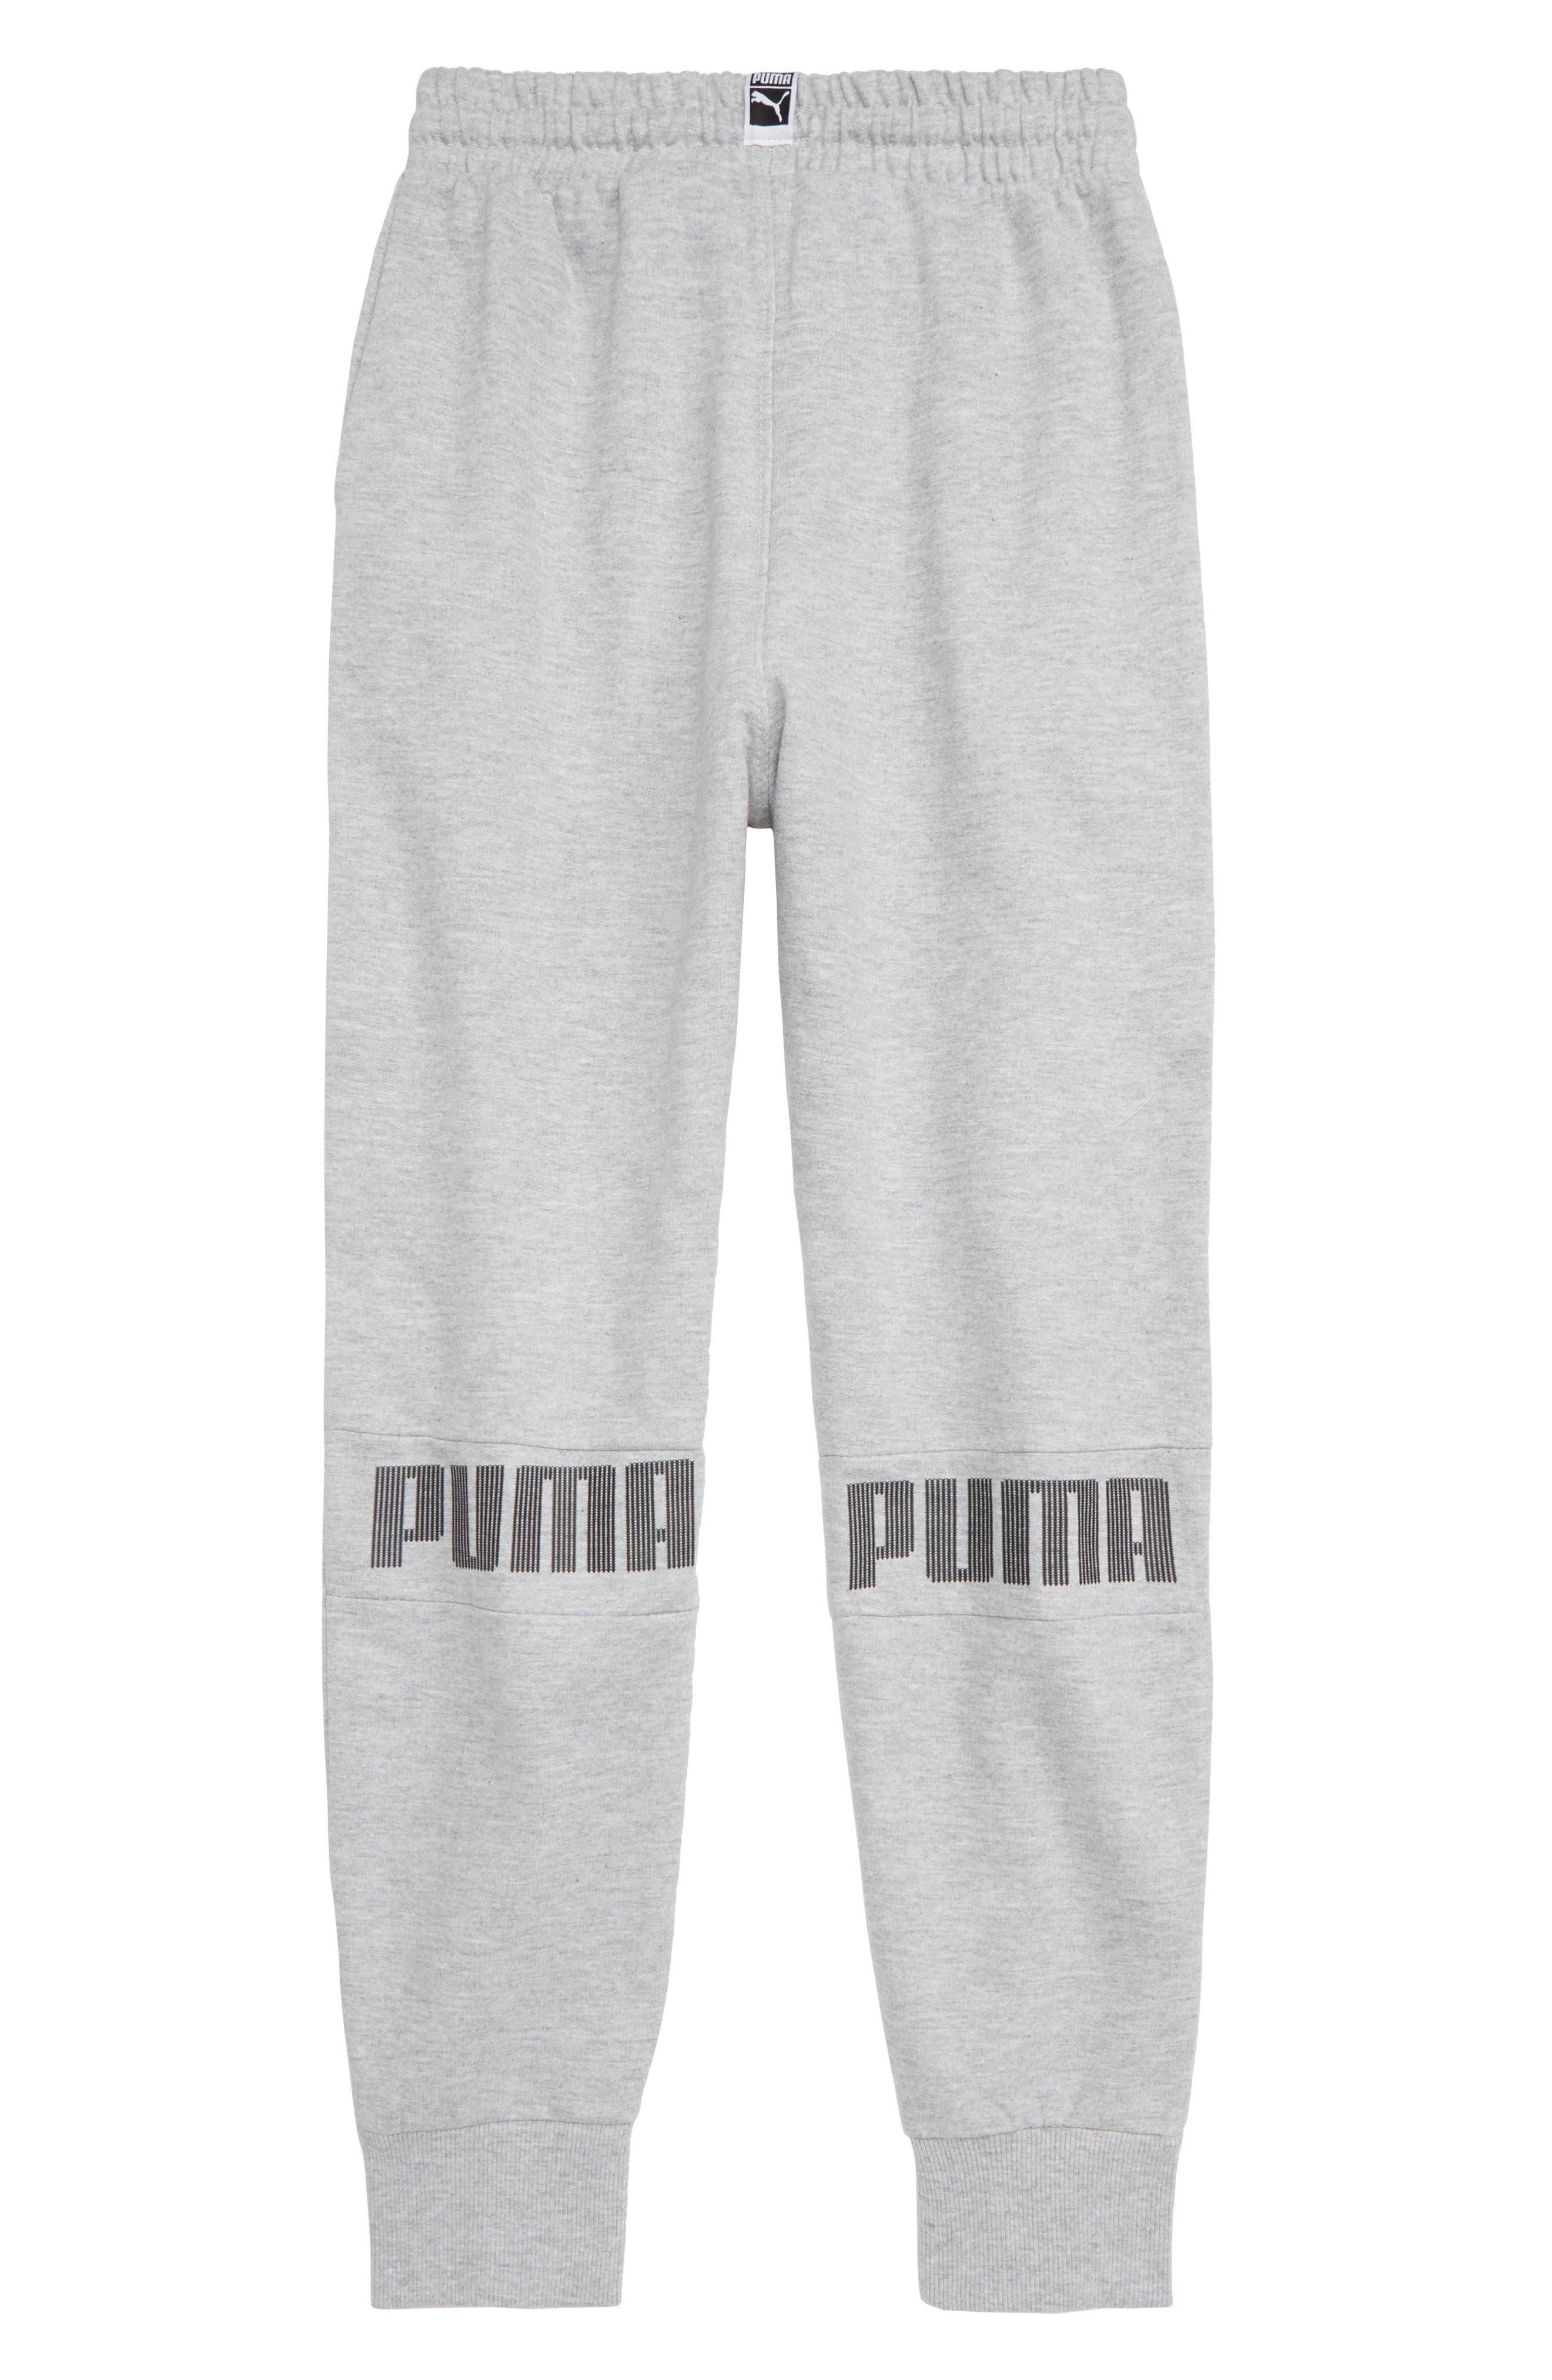 PUMA,                             Fleece Jogger Pants,                             Alternate thumbnail 2, color,                             HEATHER GREY